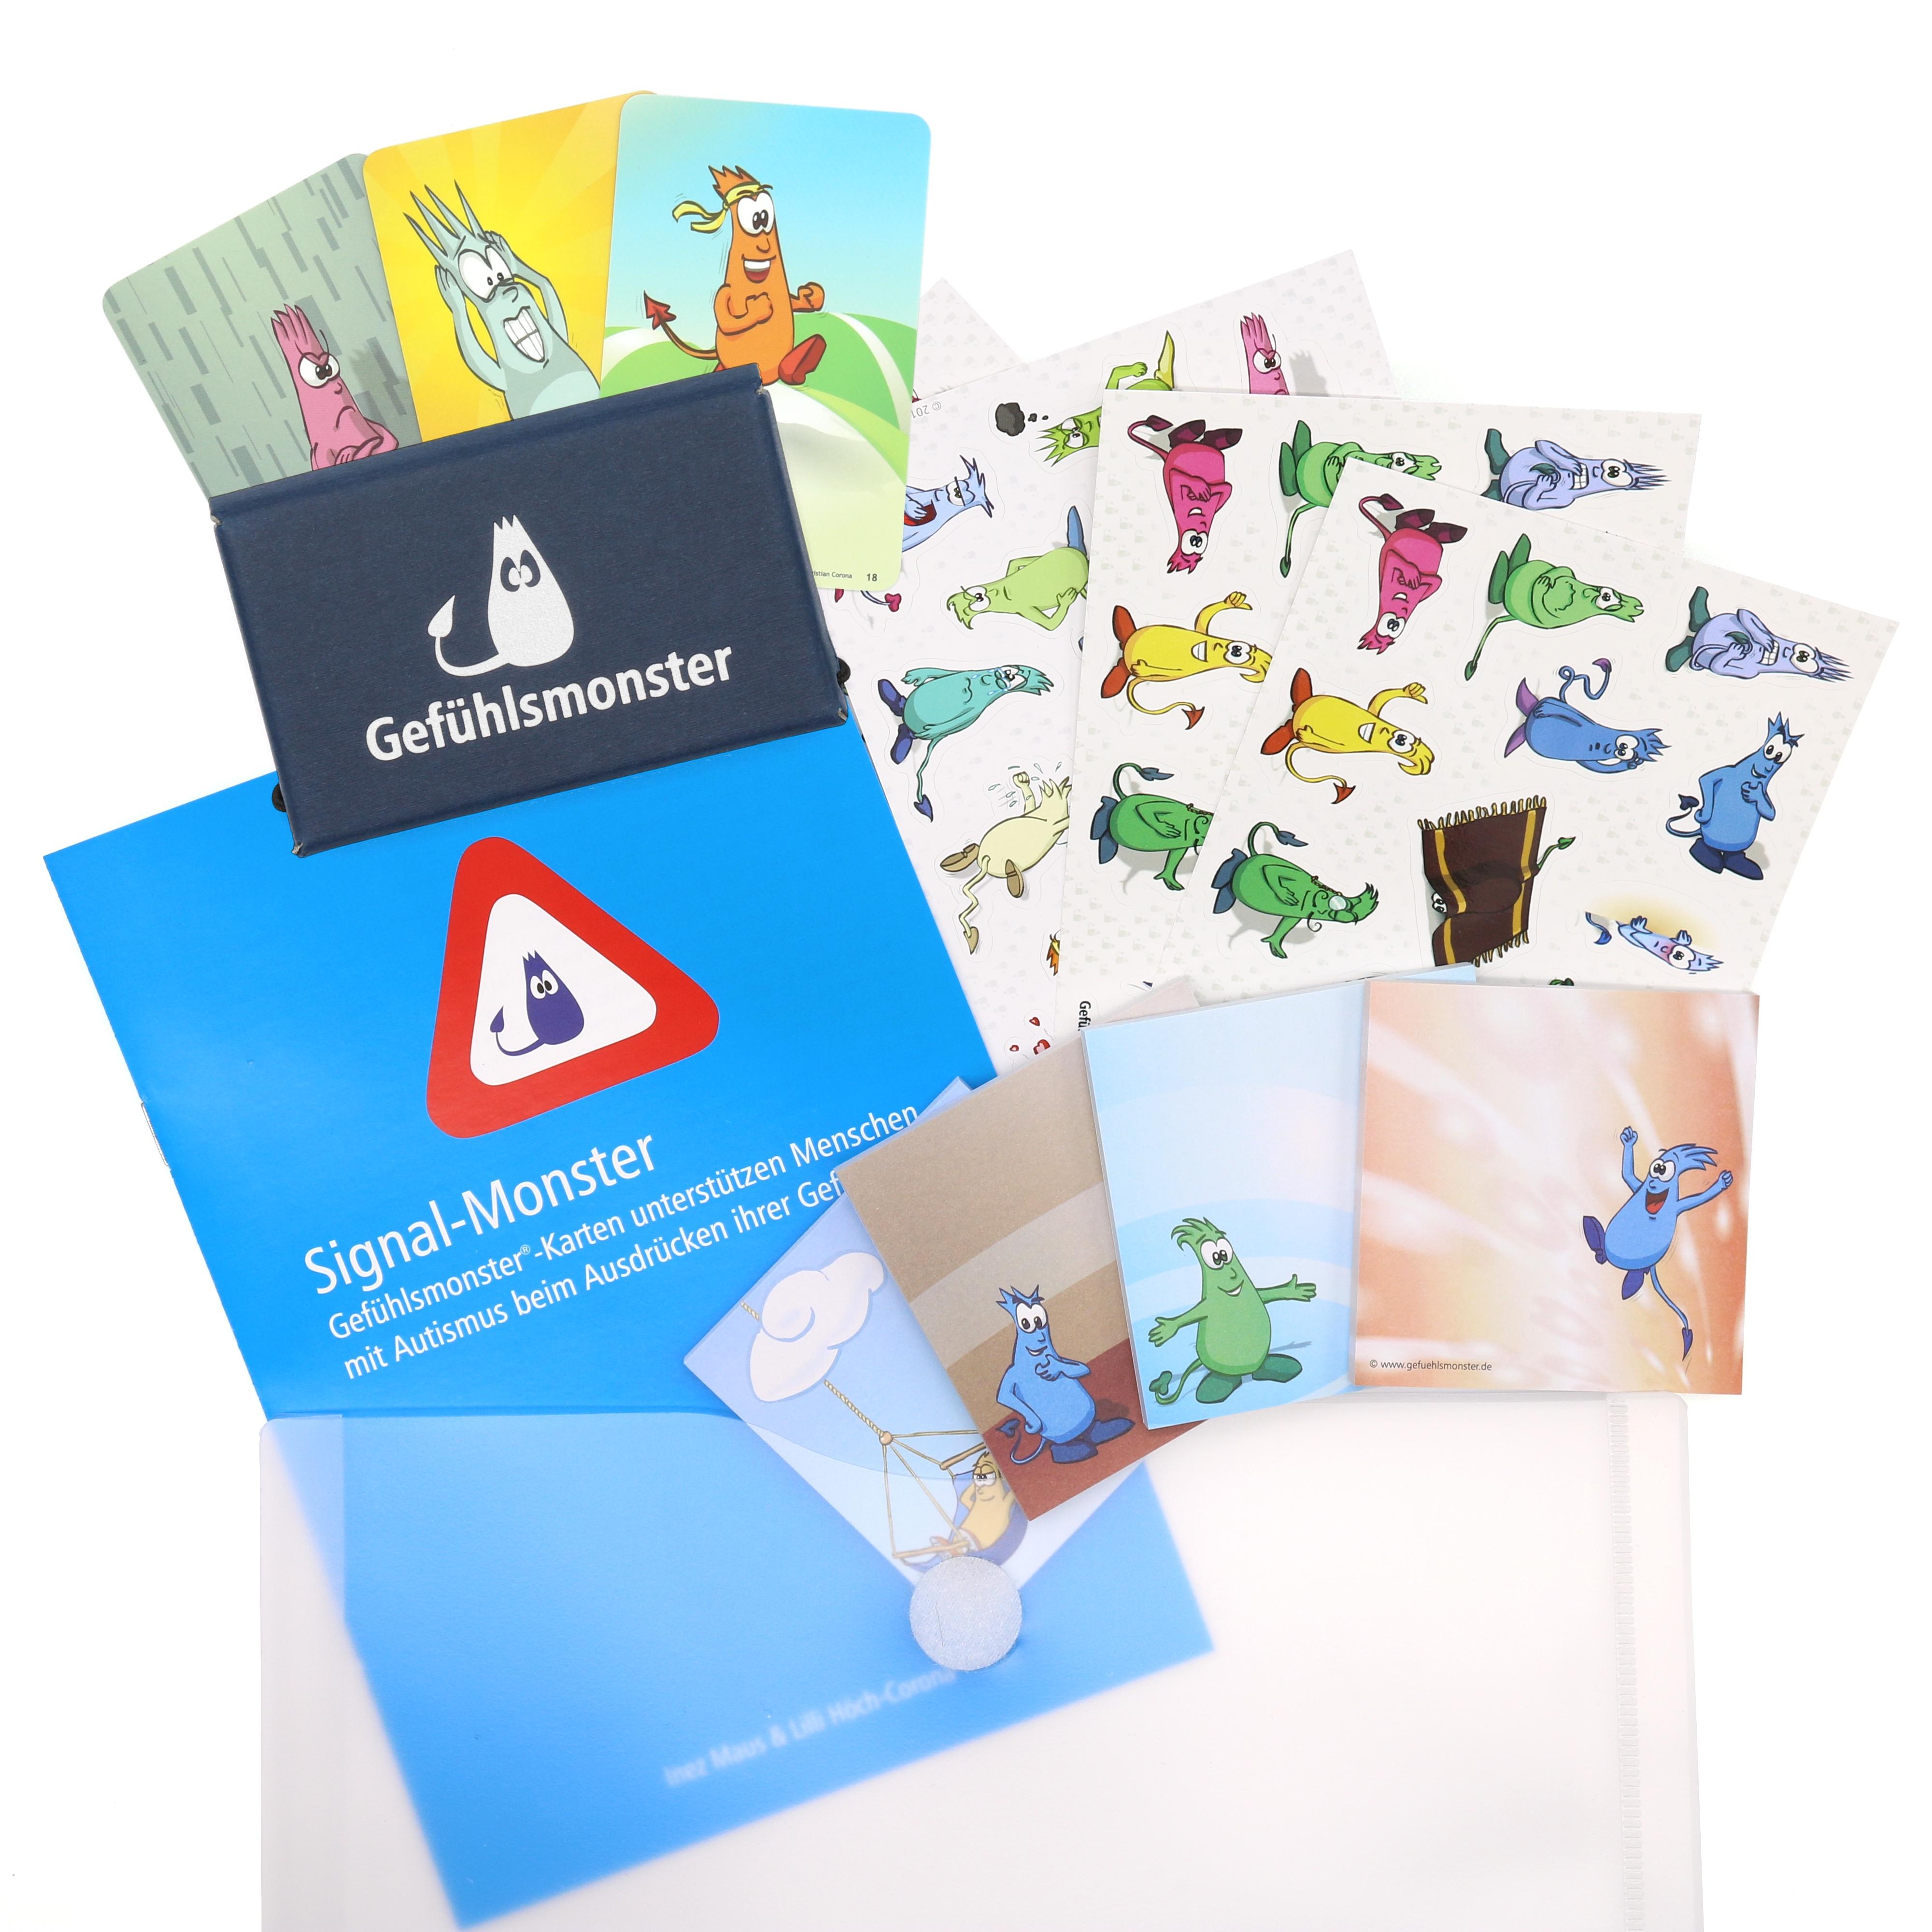 G015-AU-E-Gefuhlsmonster-Paket-Autismus-ausgepackt-av-1